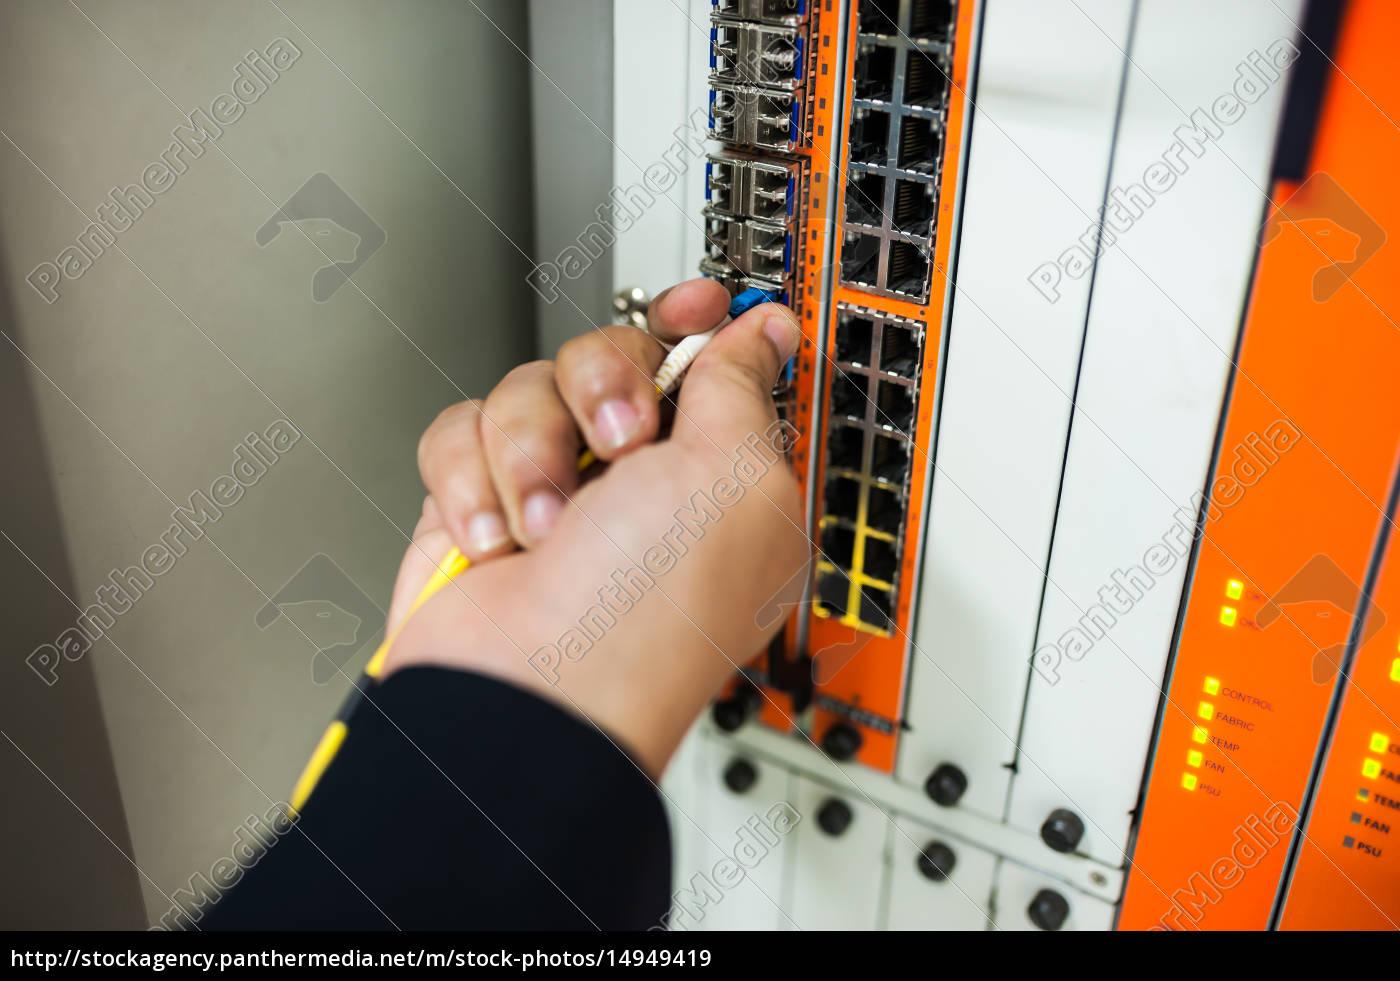 fix, network, switch, in, data, center - 14949419